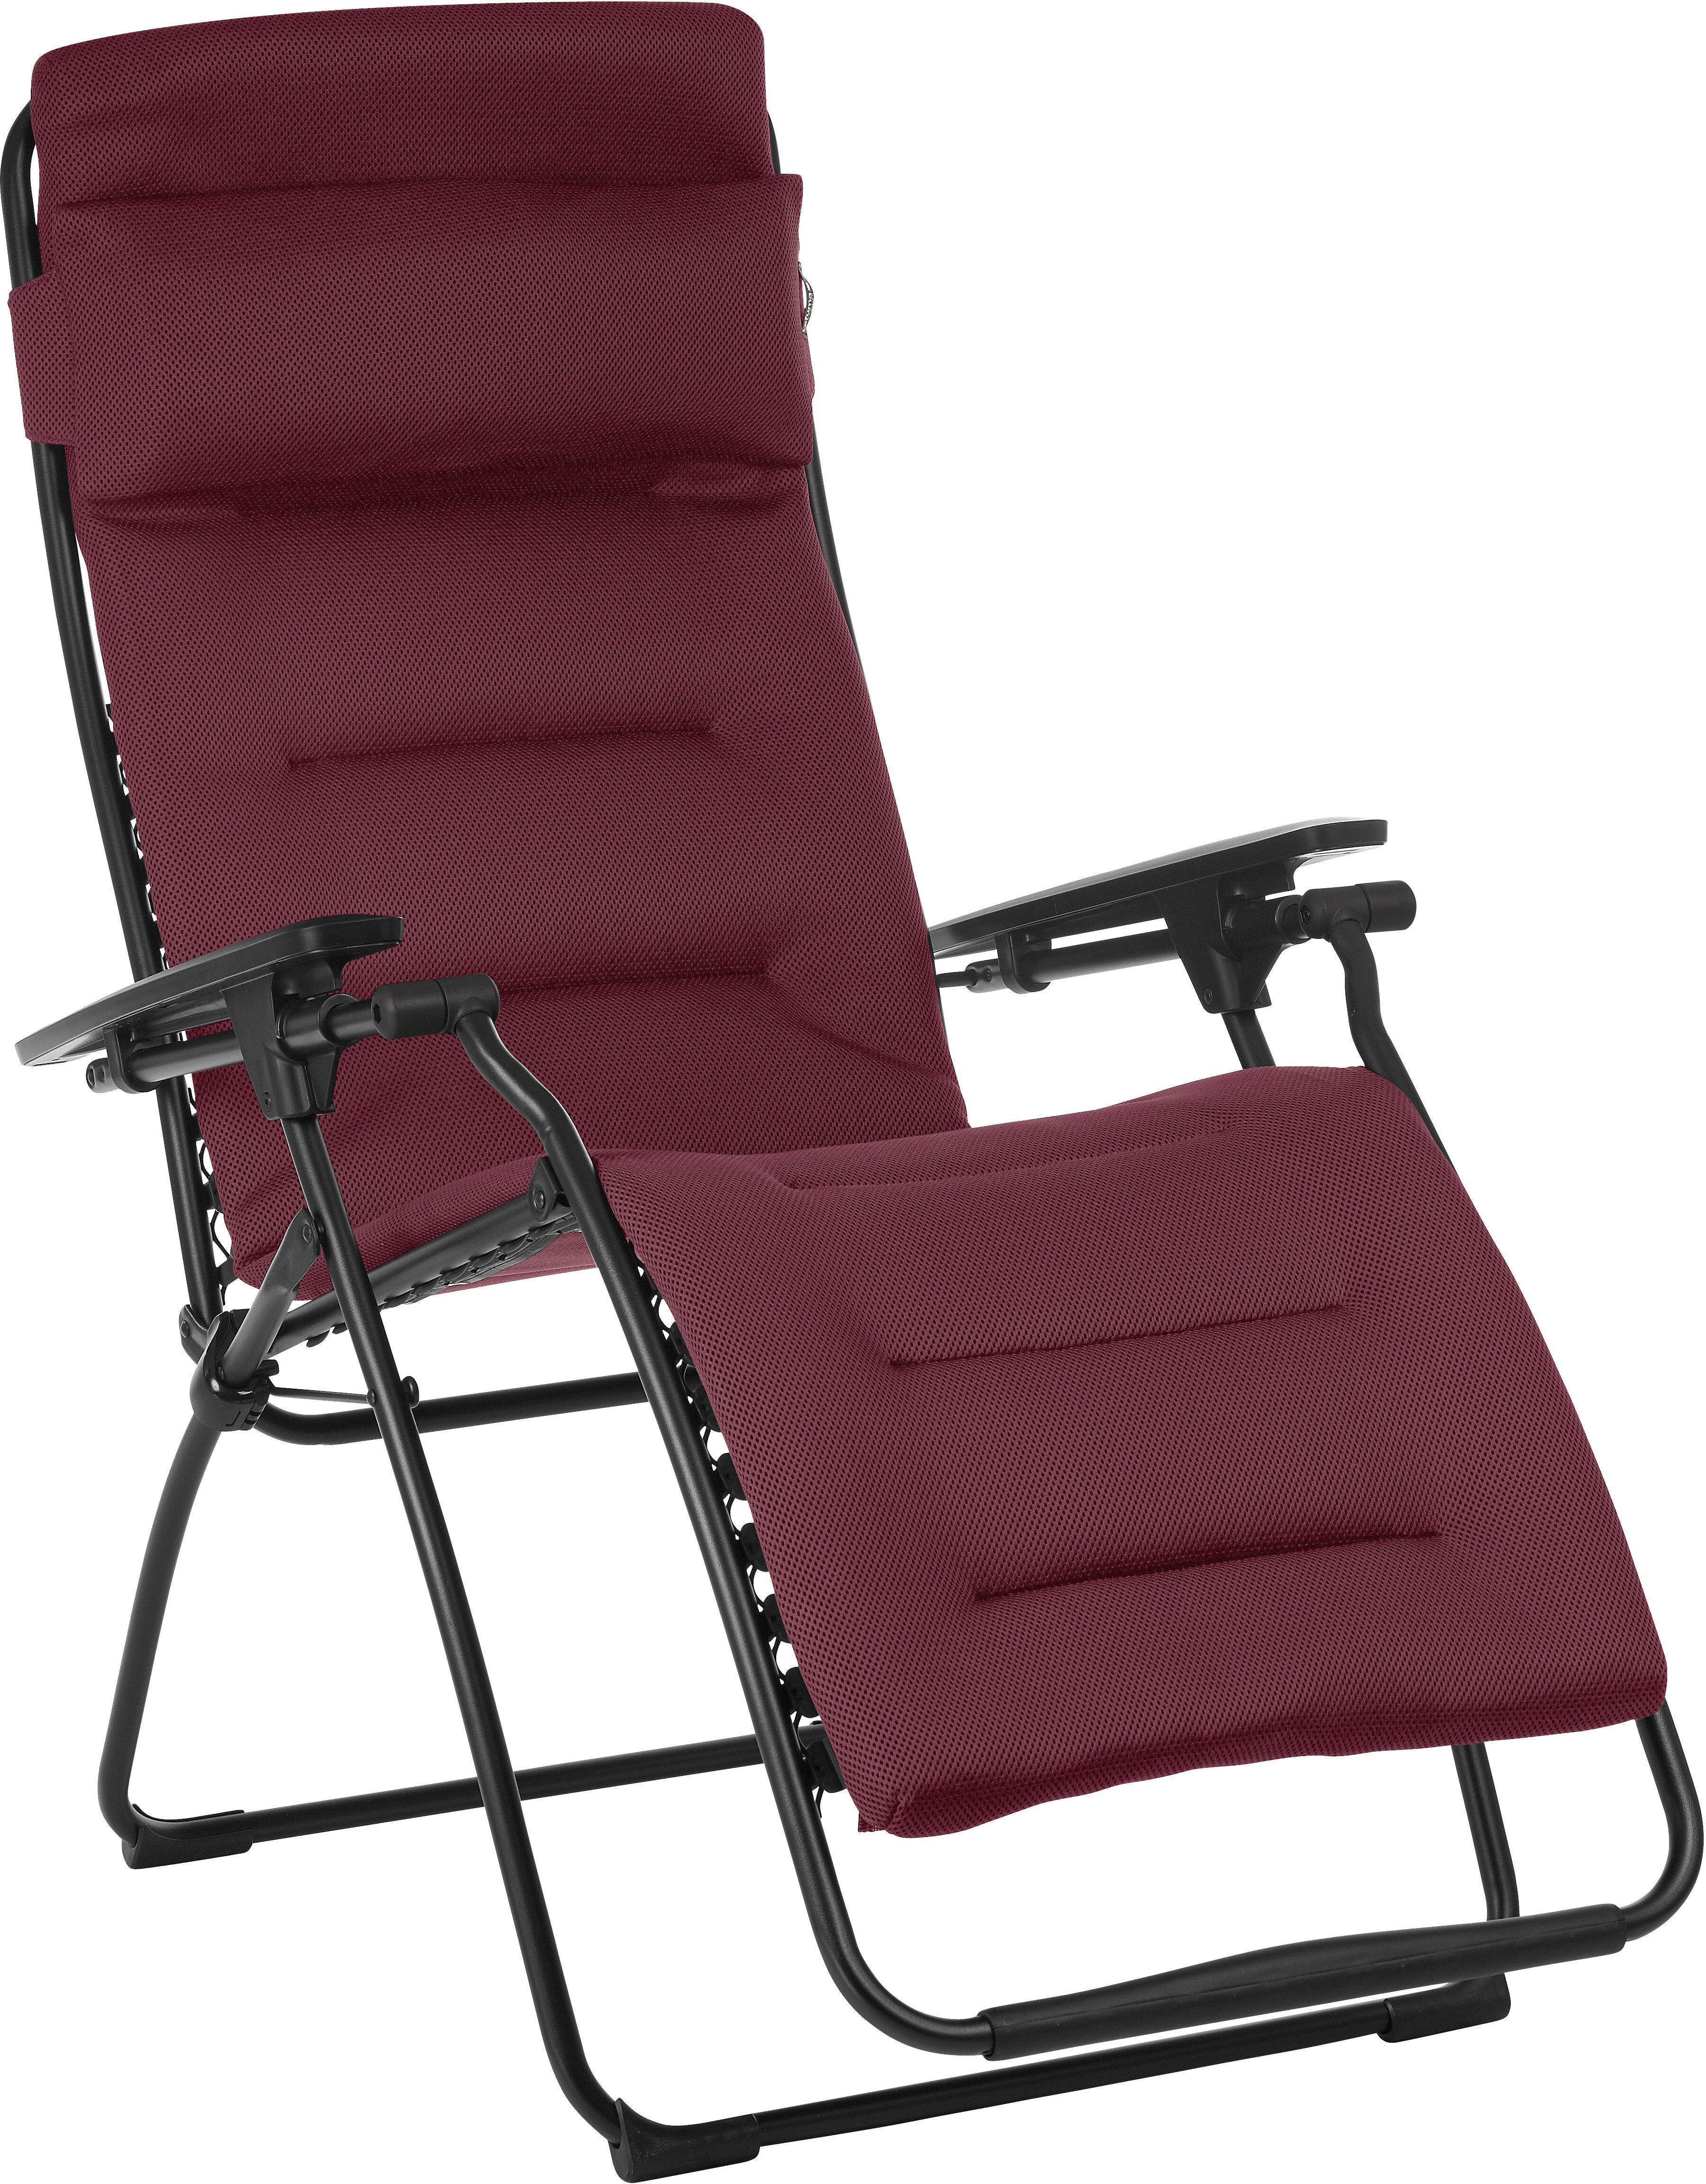 lafuma mobilier futura klappstuhl air comfort bordeaux. Black Bedroom Furniture Sets. Home Design Ideas